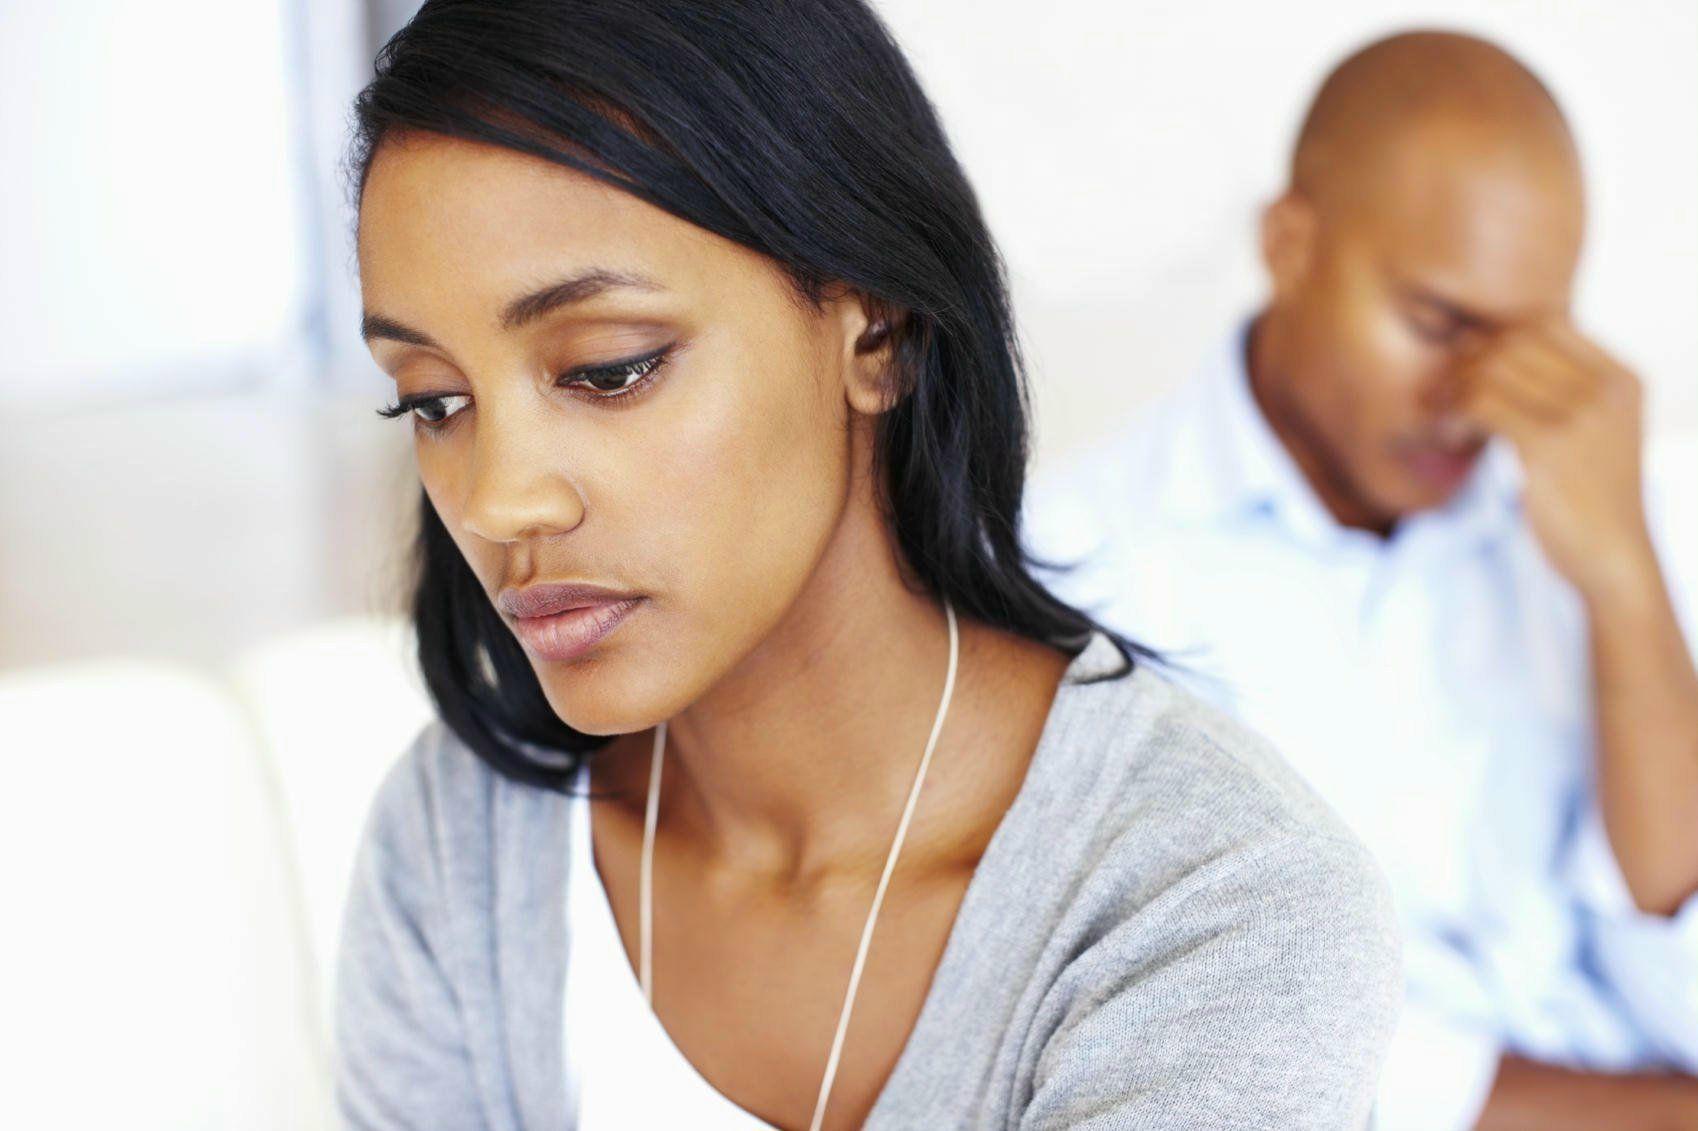 unfaithful-black-woman-relationship